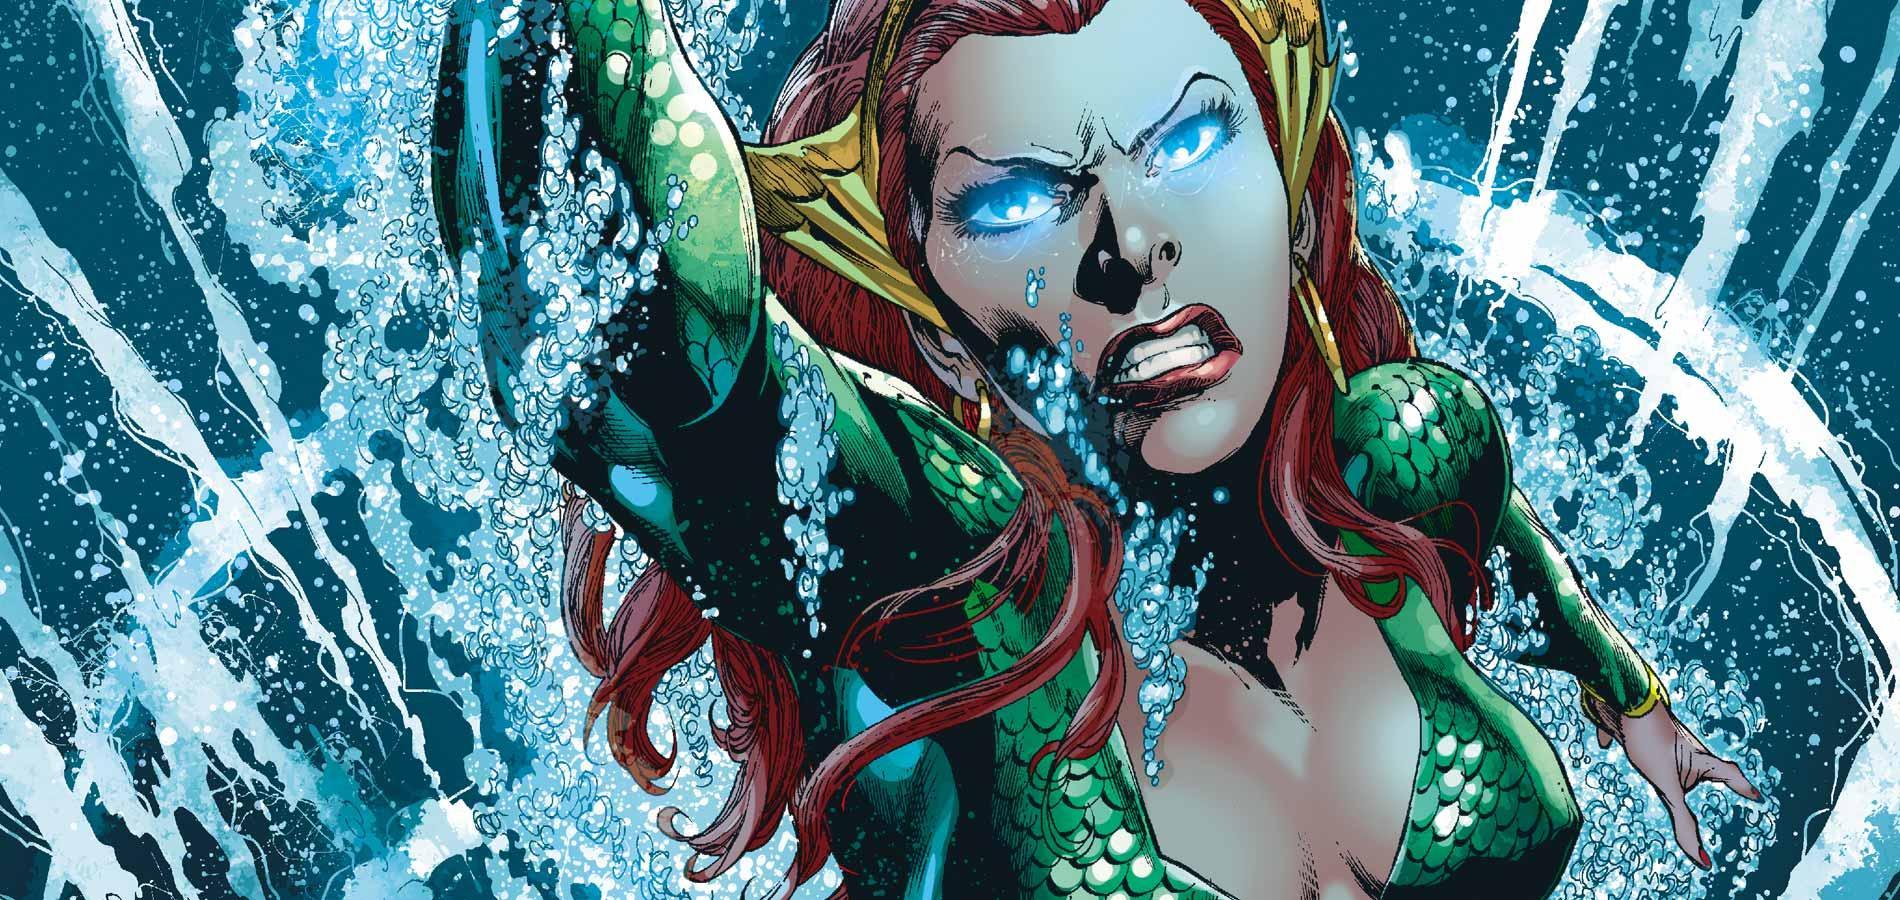 King Julian Hd Wallpaper Justice League First Look At Amber Heard As Aquaman